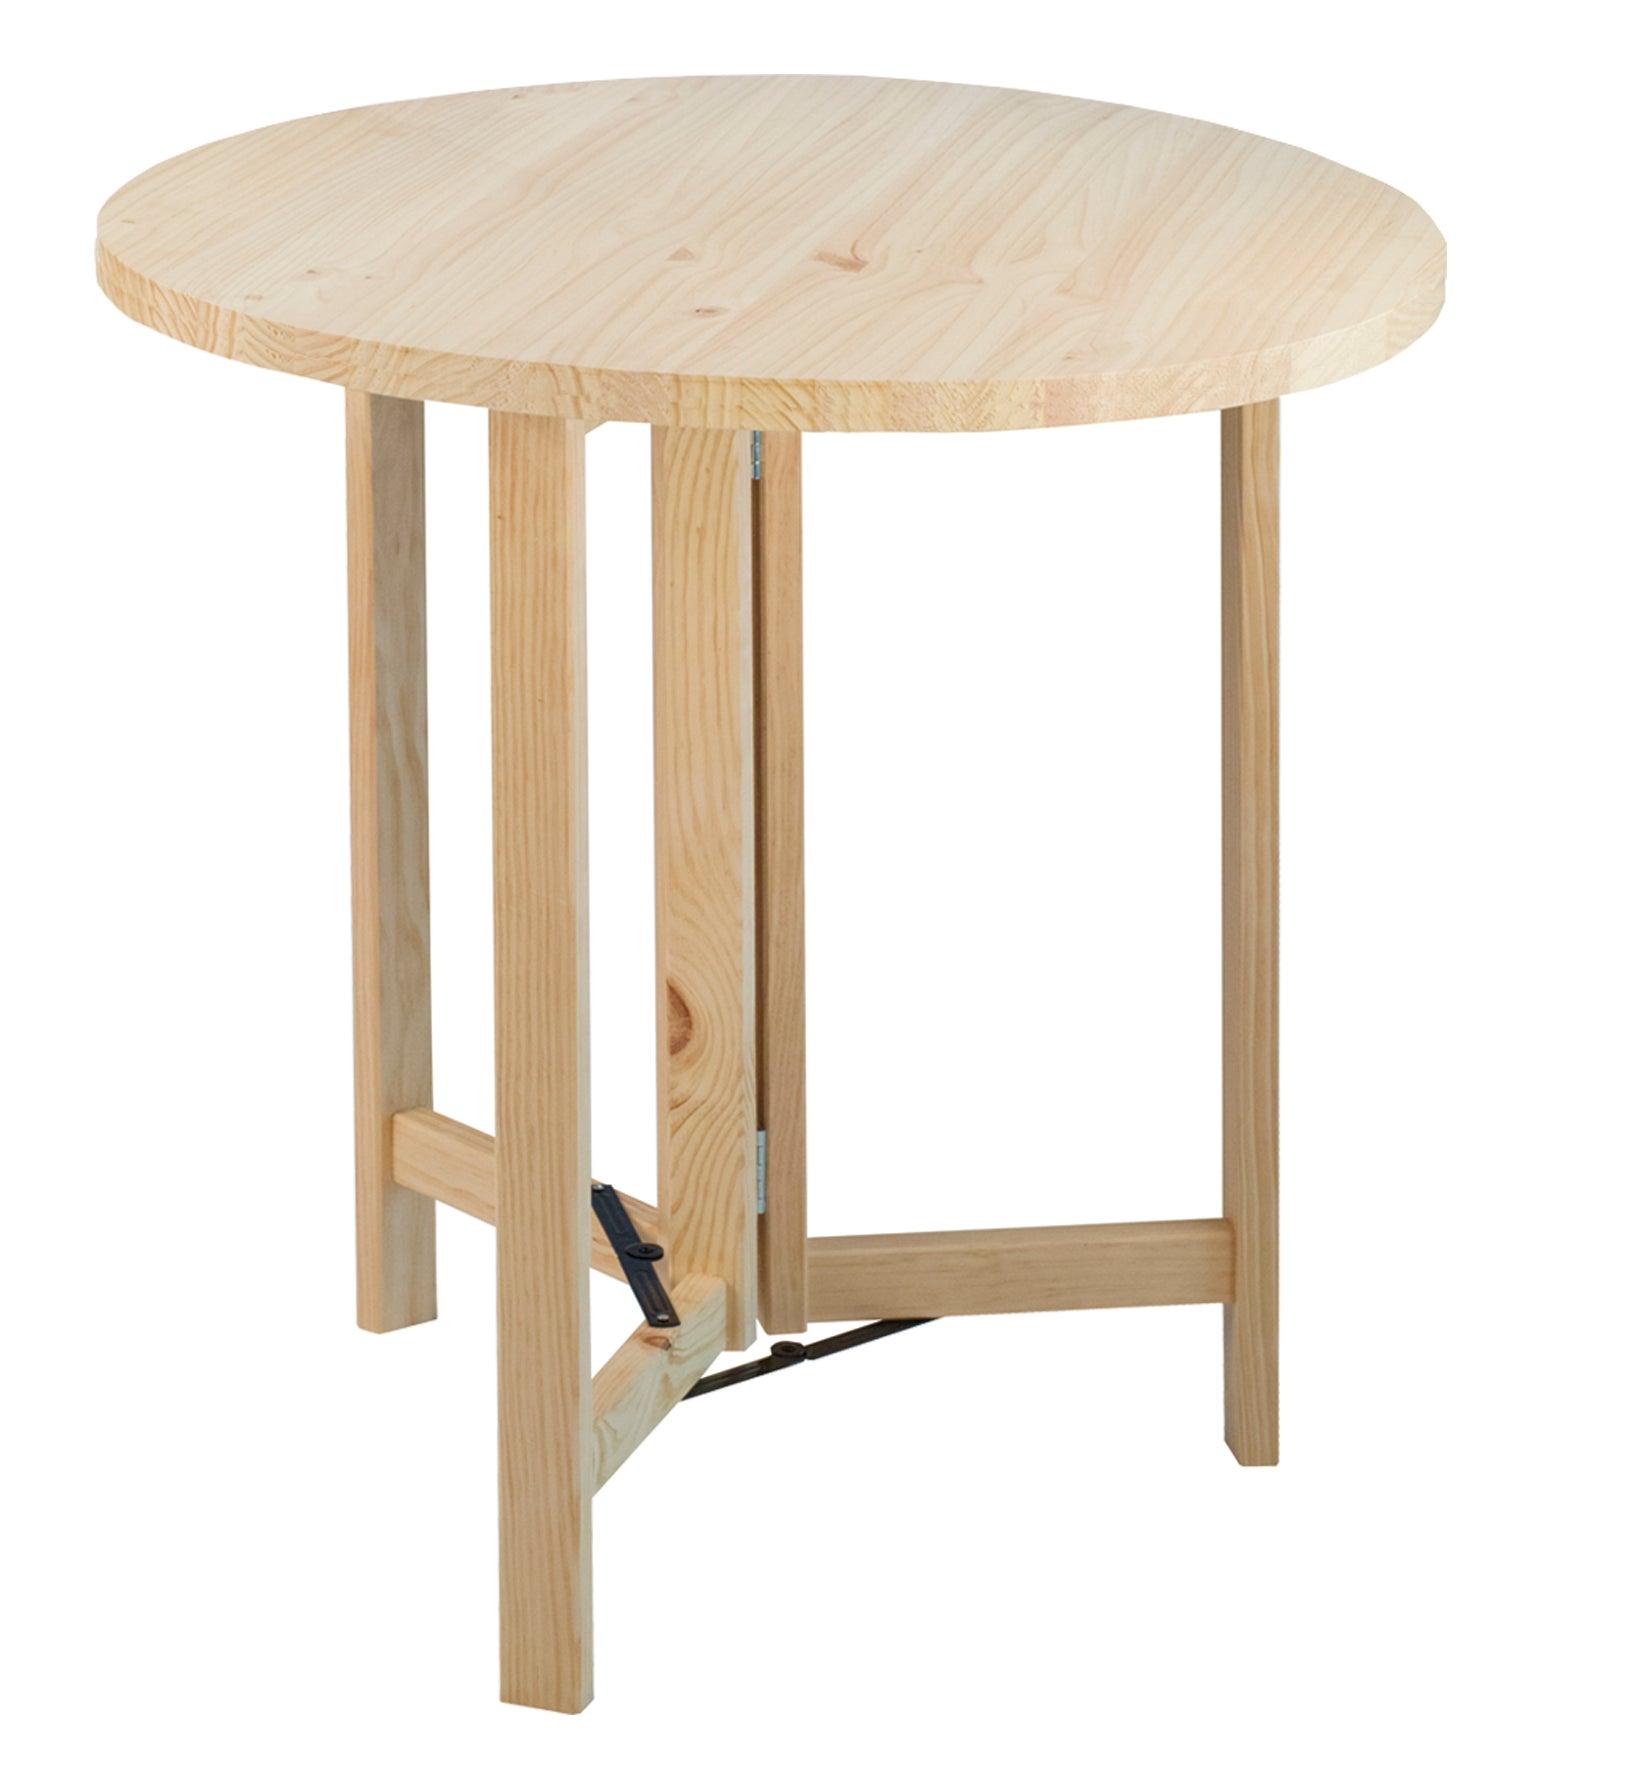 plateau de table pin massif l75 x l75 cm x ep35 mm